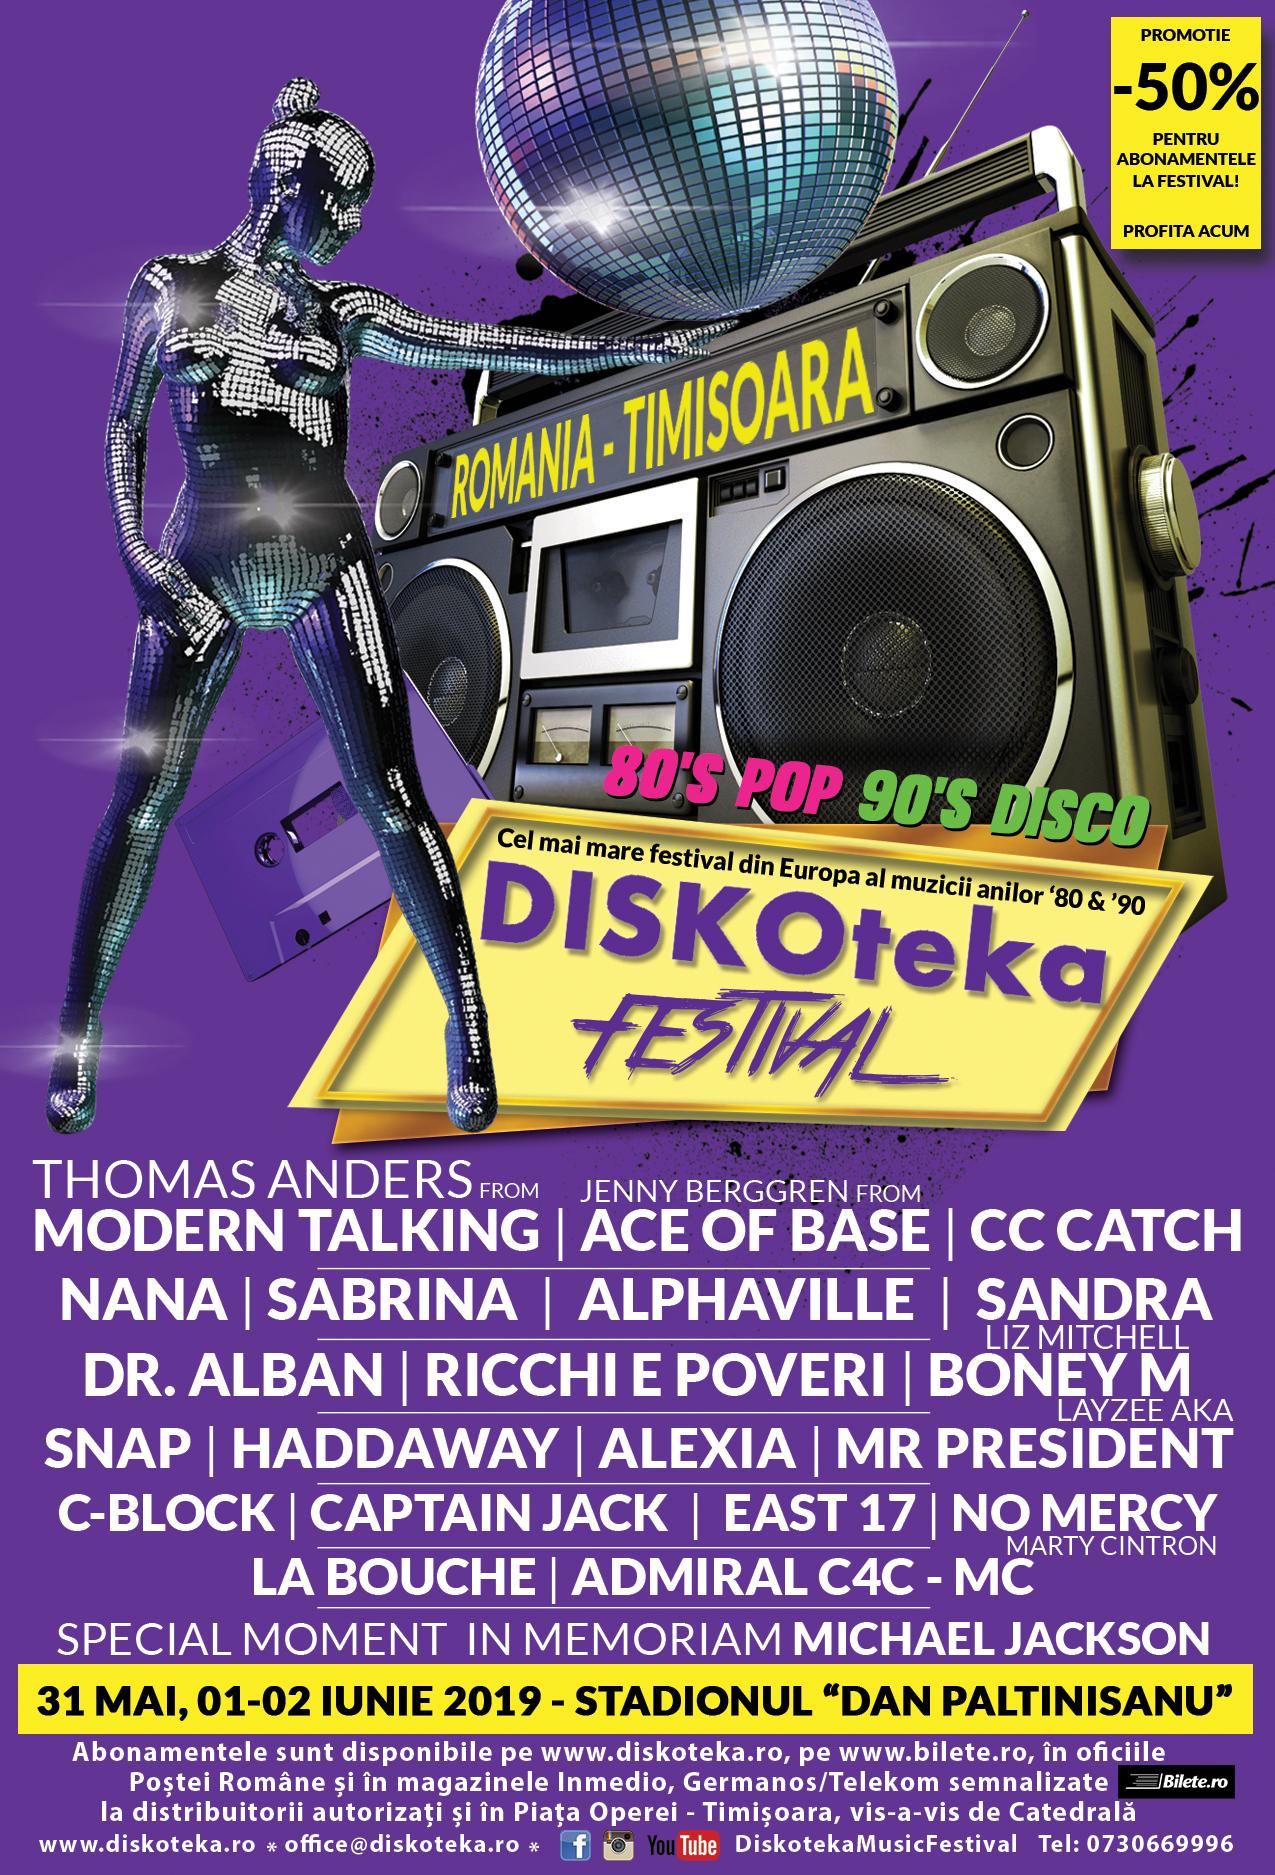 Afis-Diskoteka-Festival-2019_2.jpg